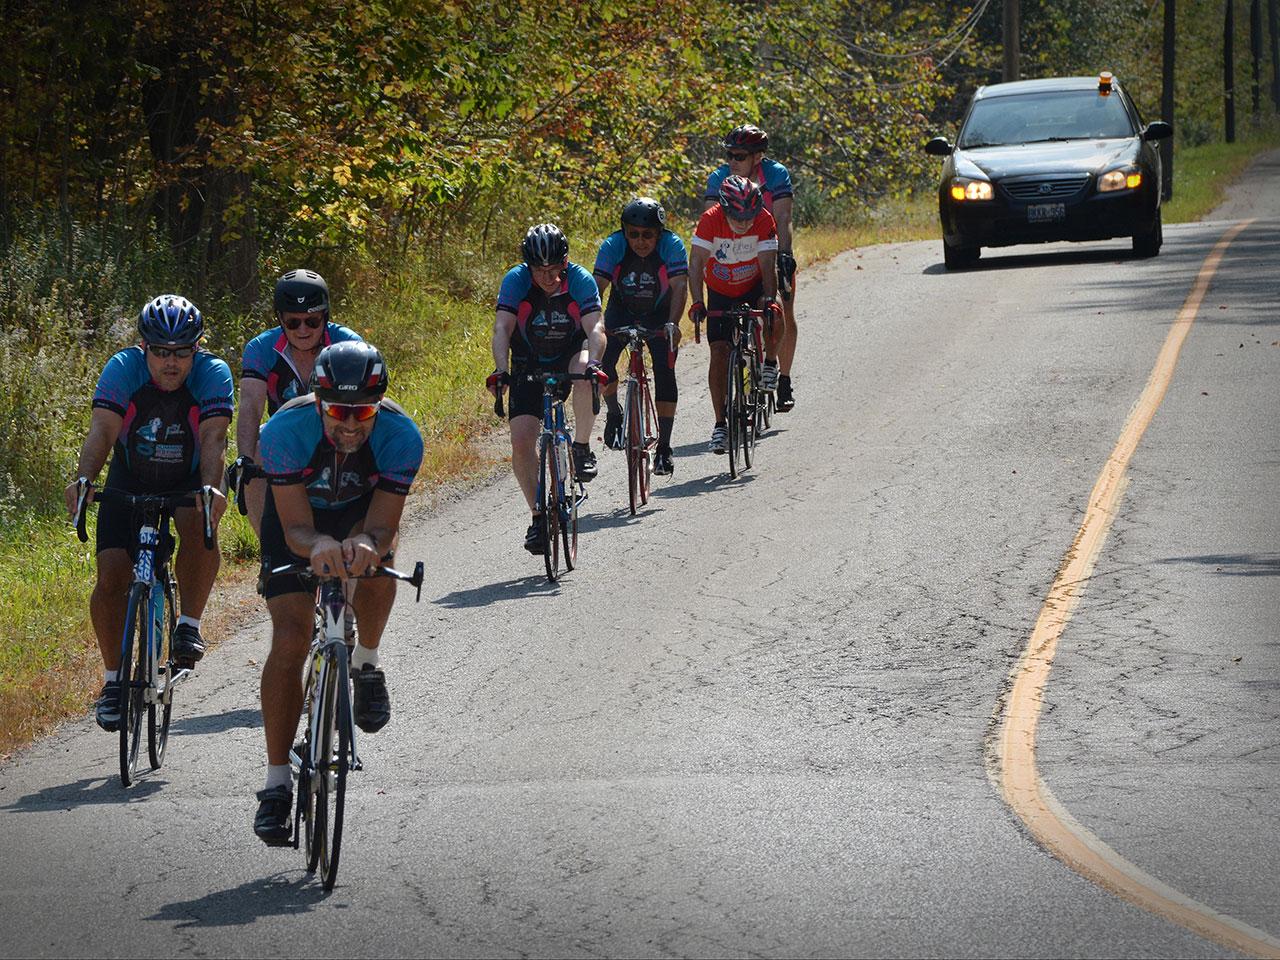 Ride for Farley charity bike ride in Milton, Halton, Ontario